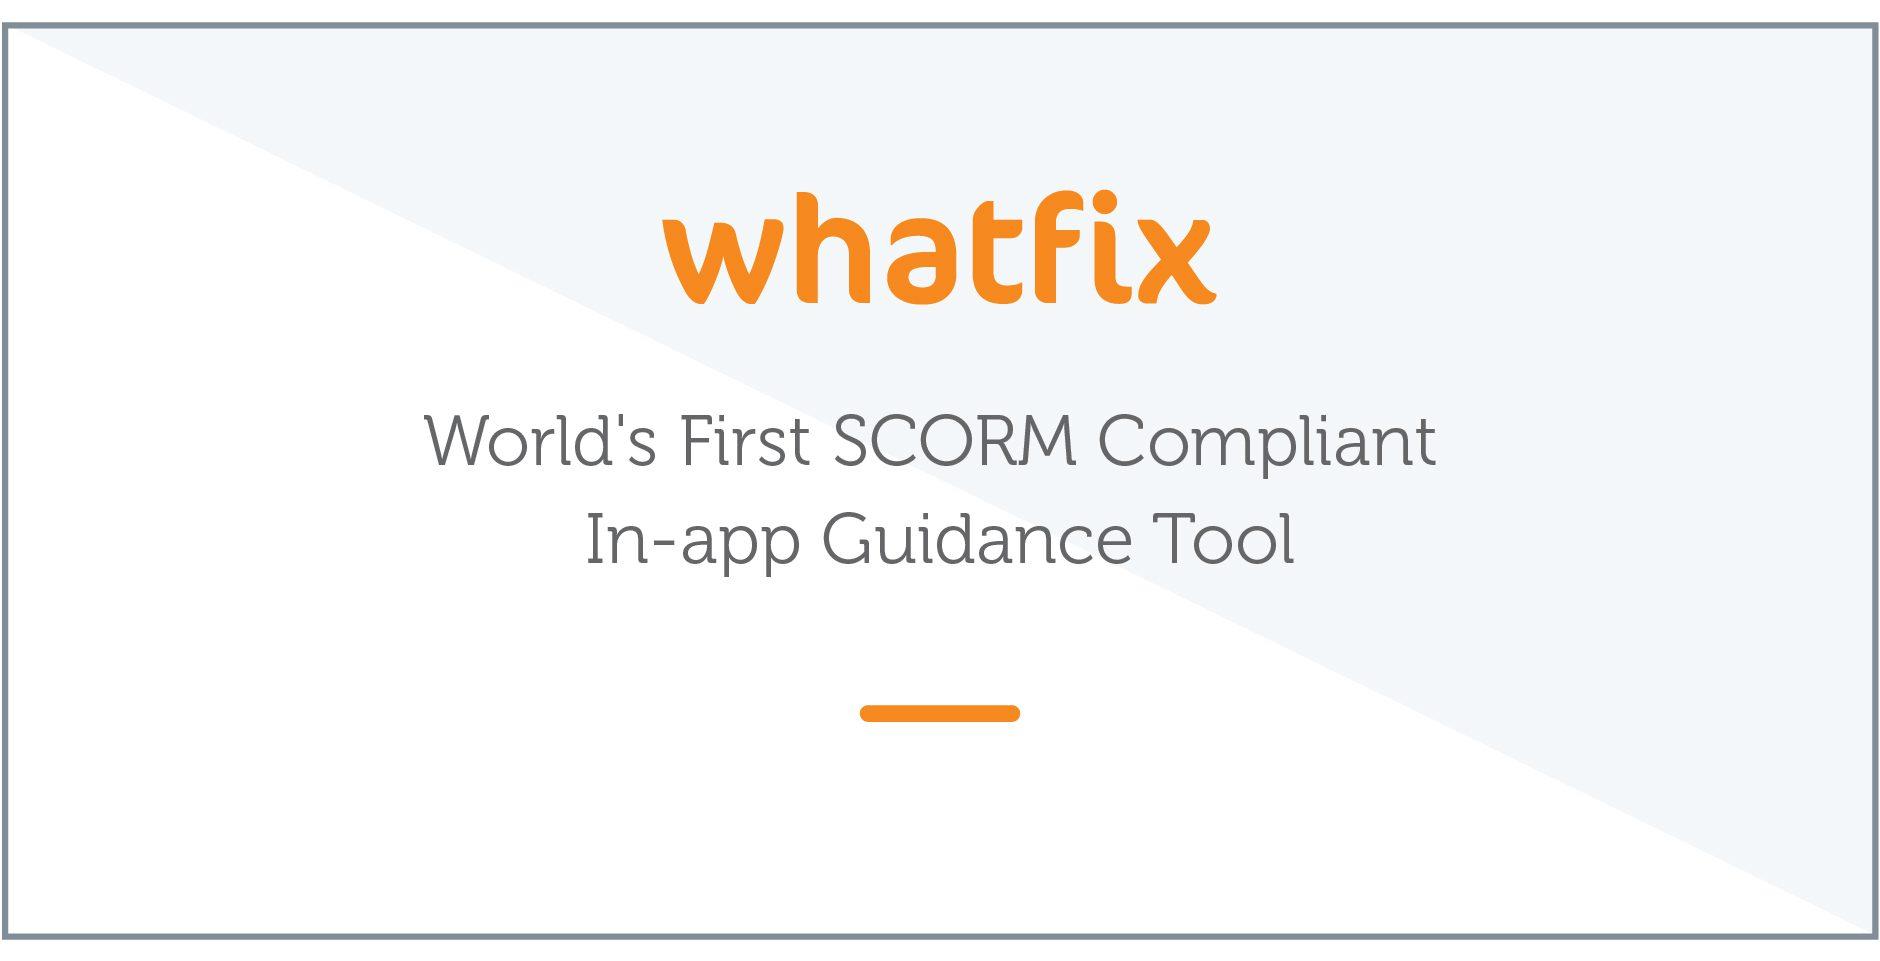 Whatfix SCORM compliance